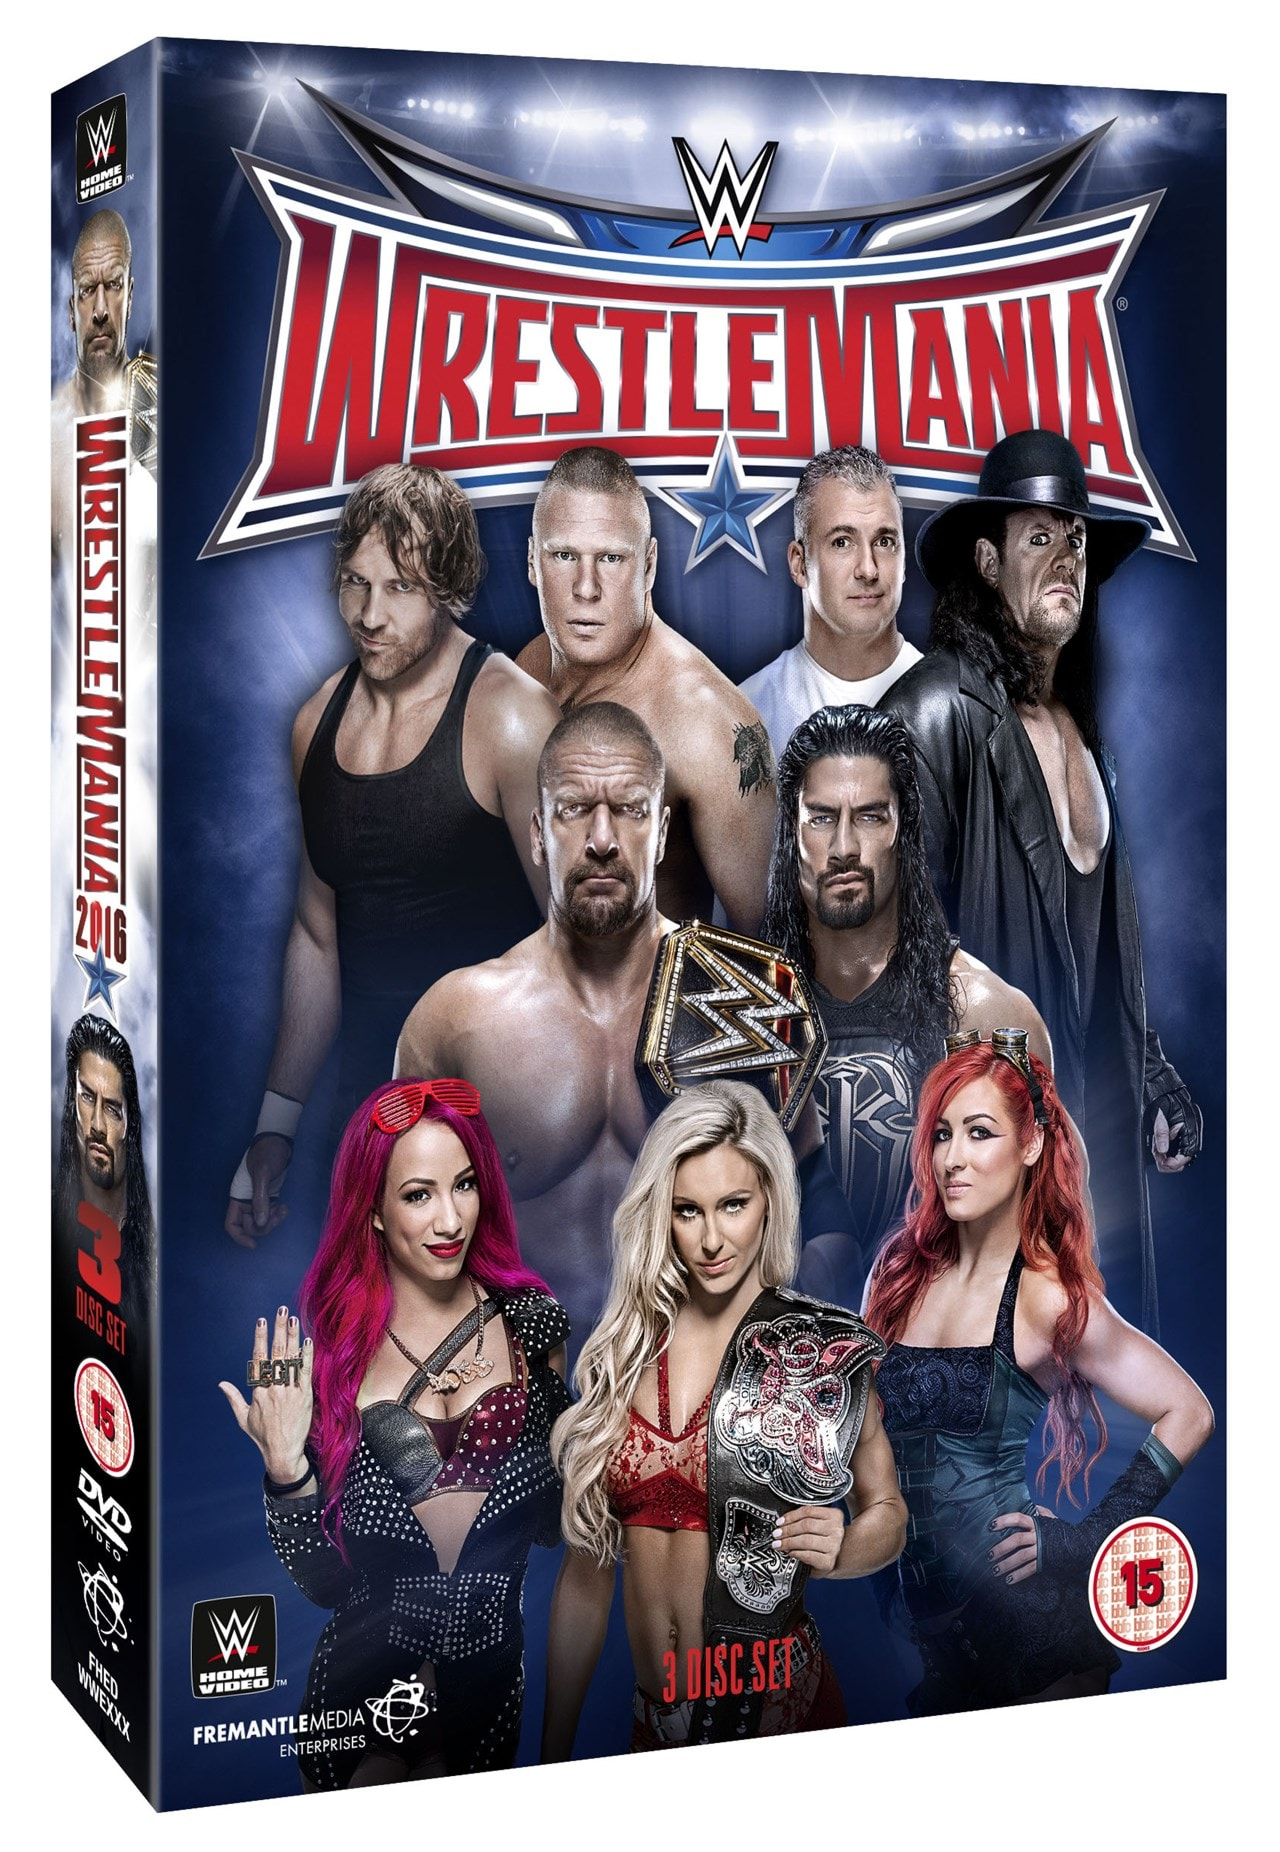 WWE: Wrestlemania 32 - 1